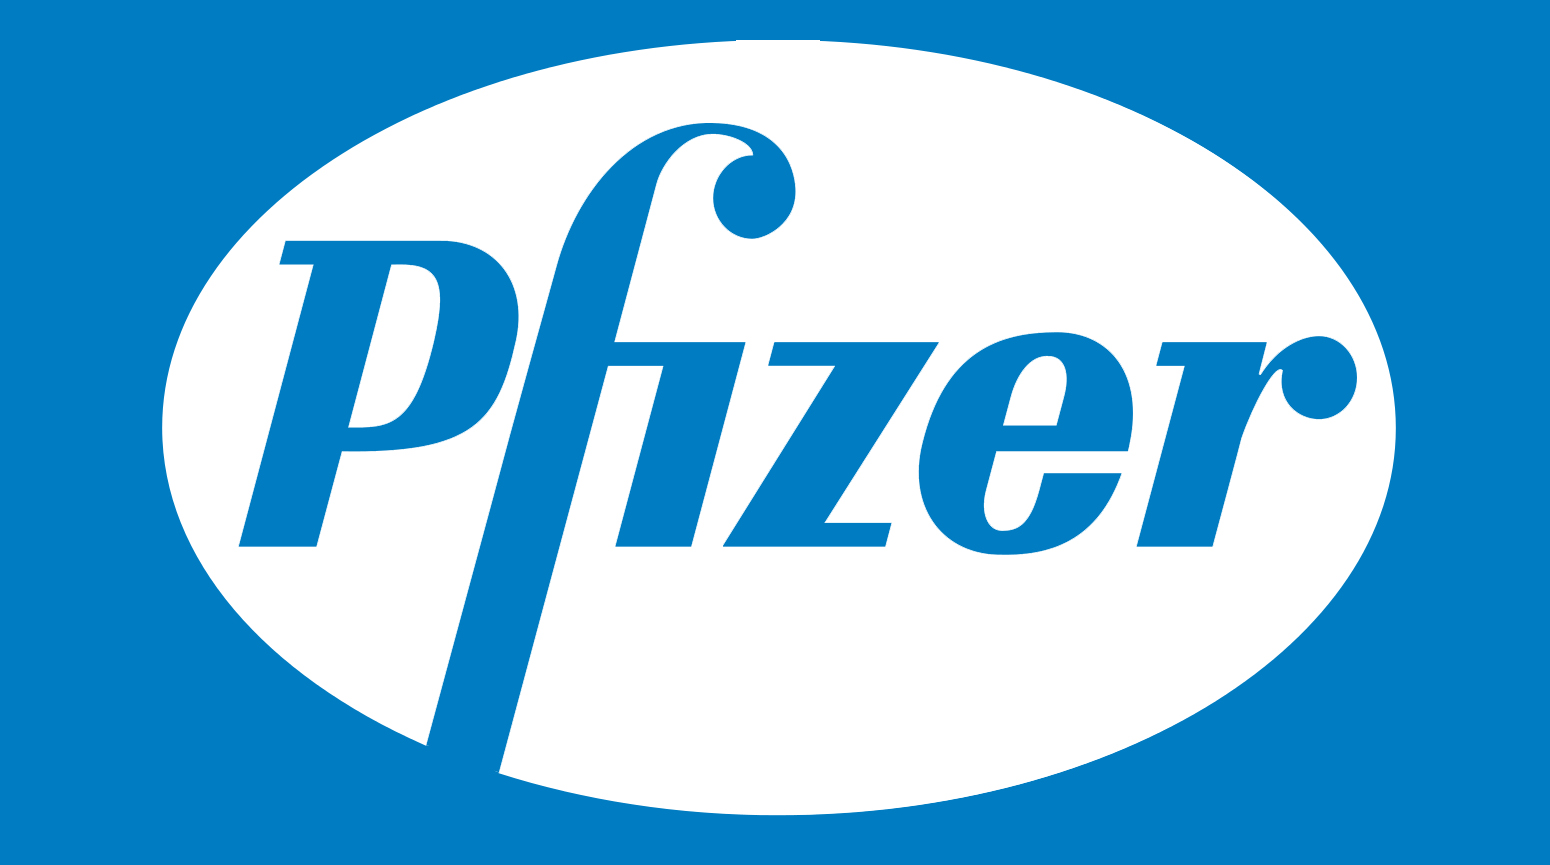 Pfizer clipart svg free download Confirmed Sponsors & Exhibitors | CRPS Cork 2017 svg free download